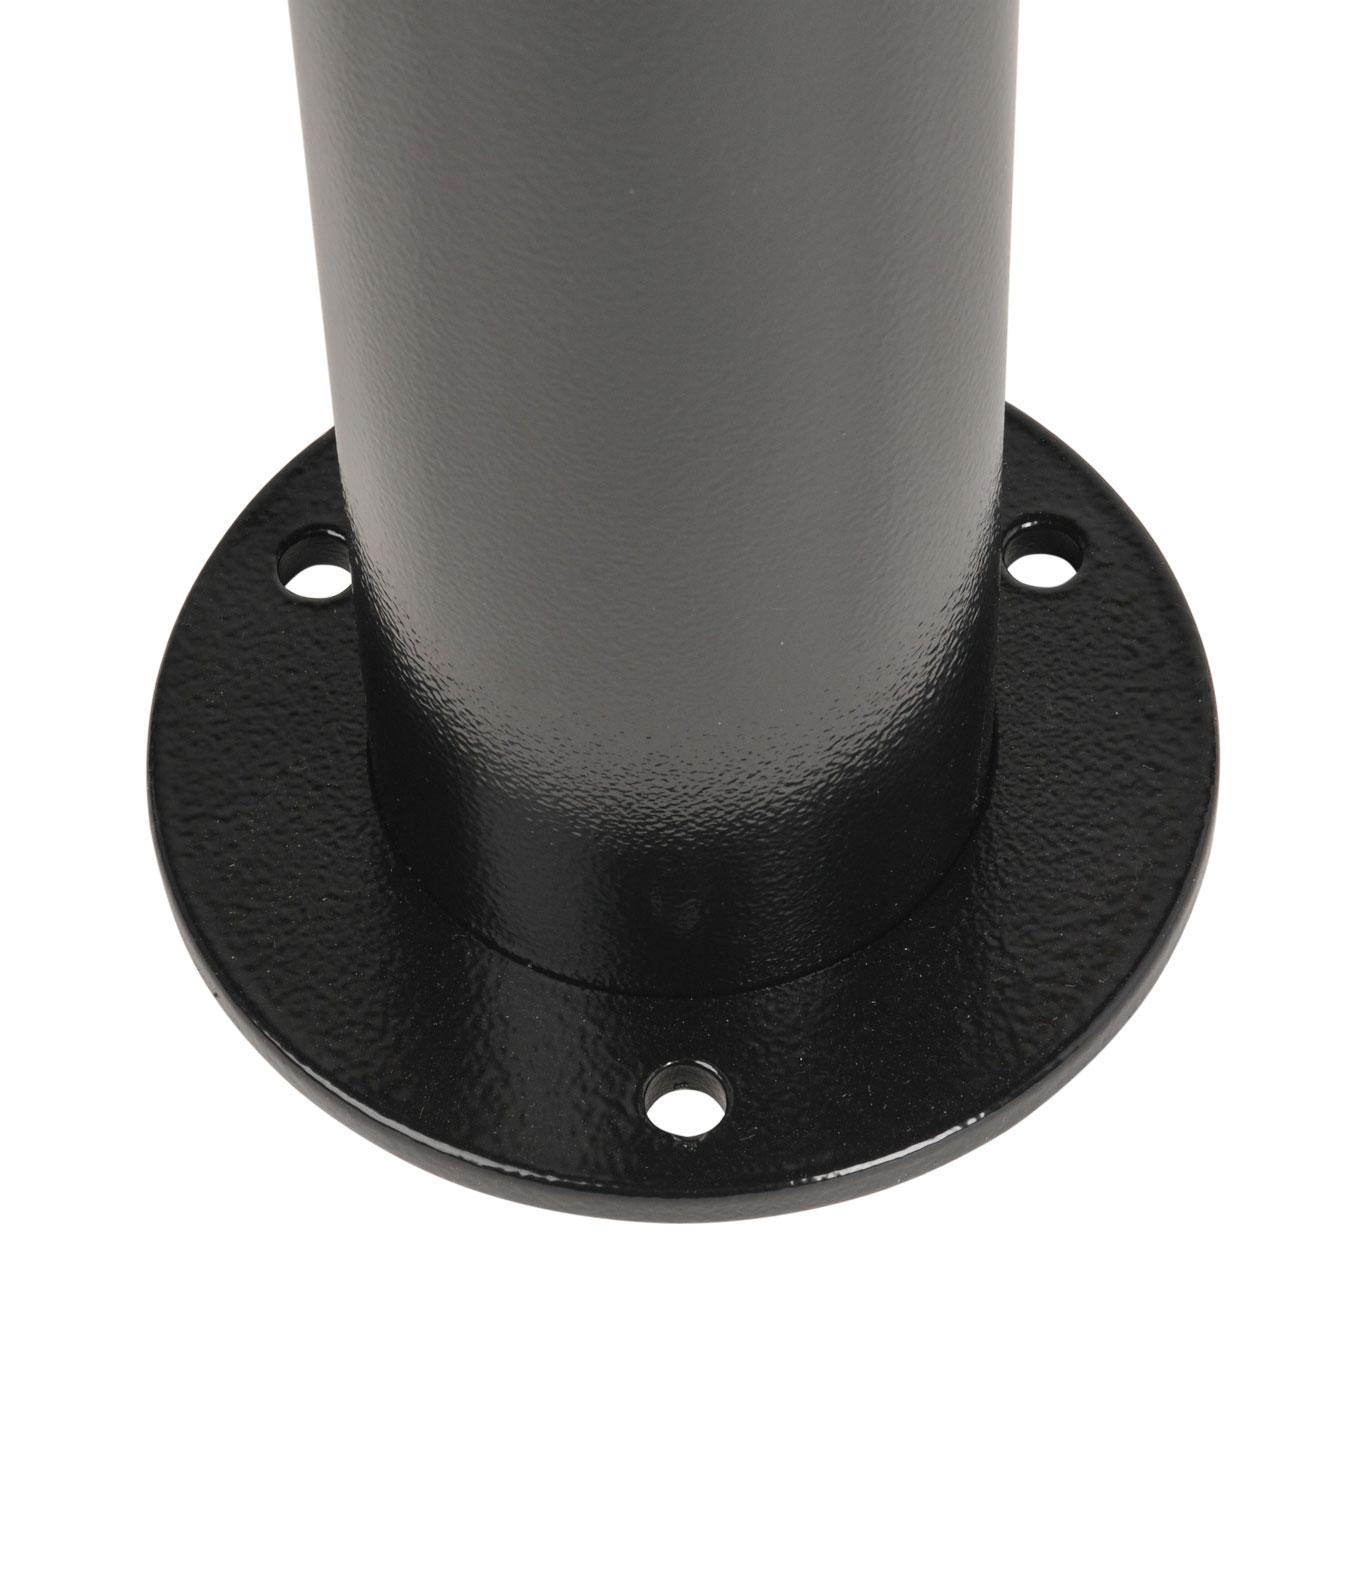 steel surface flange for bollard